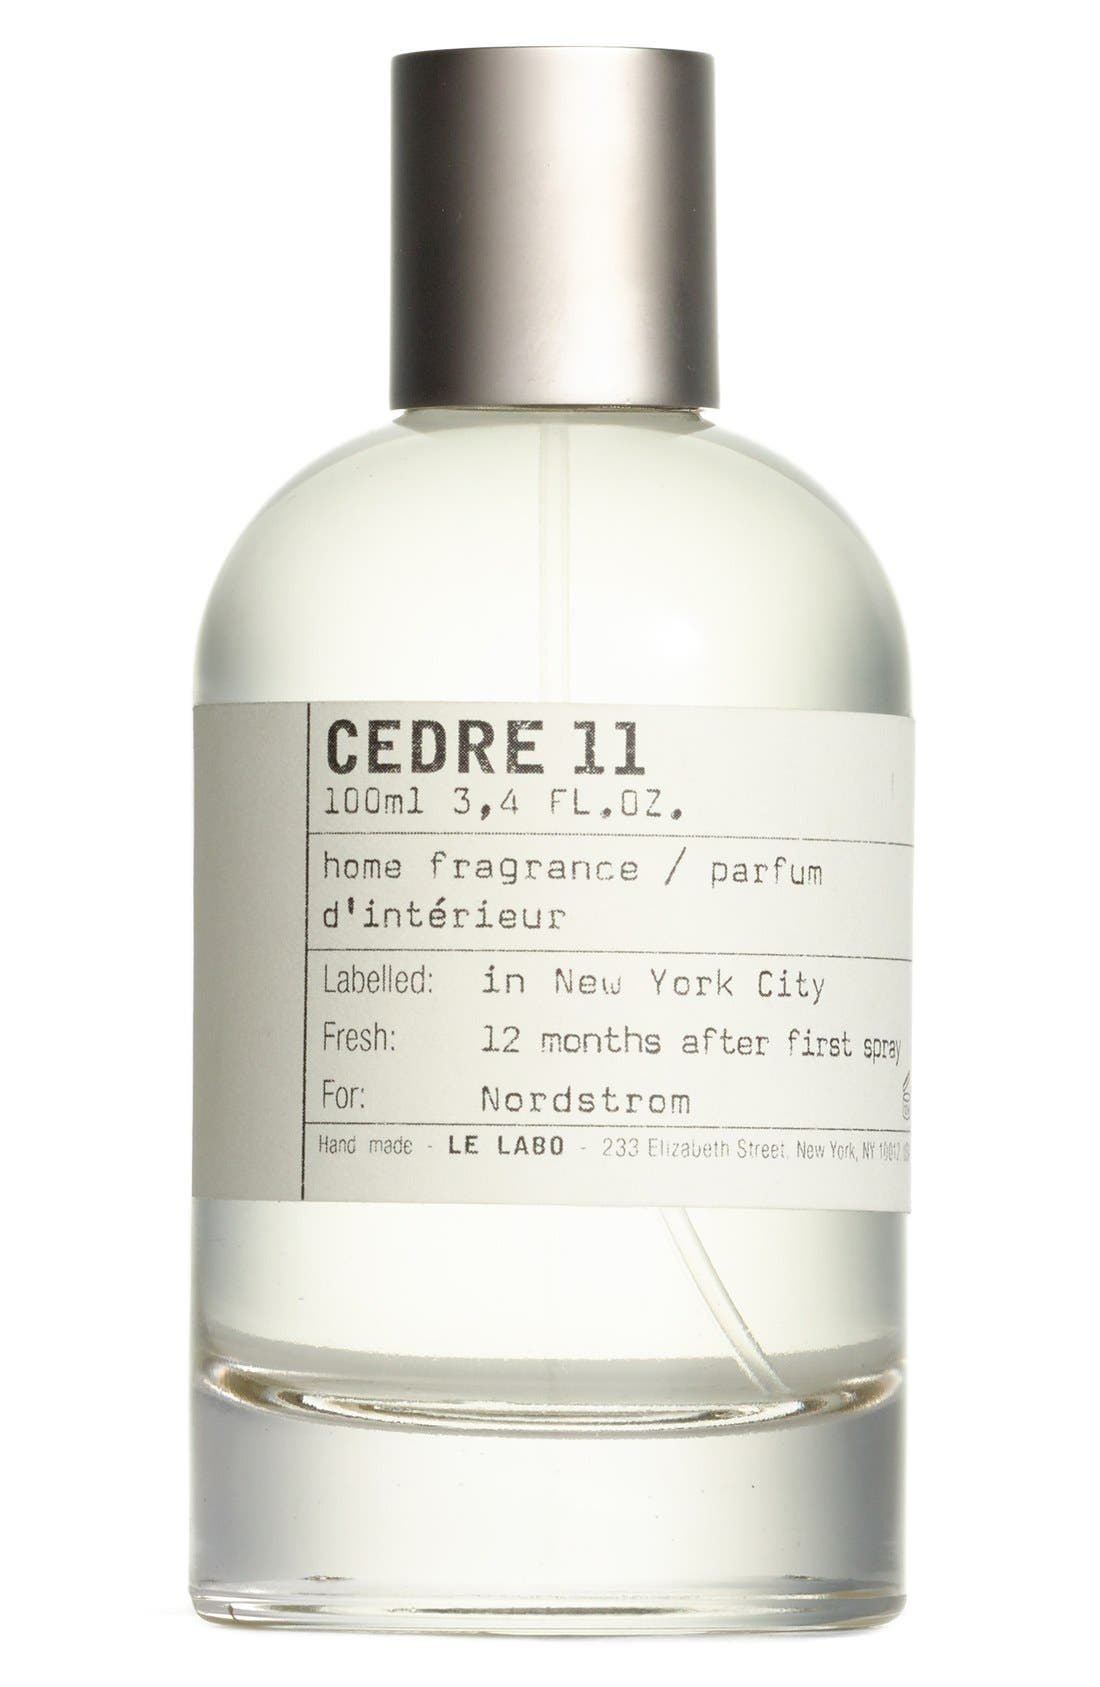 Le Labo 'Cedre 11' Home Fragrance Spray